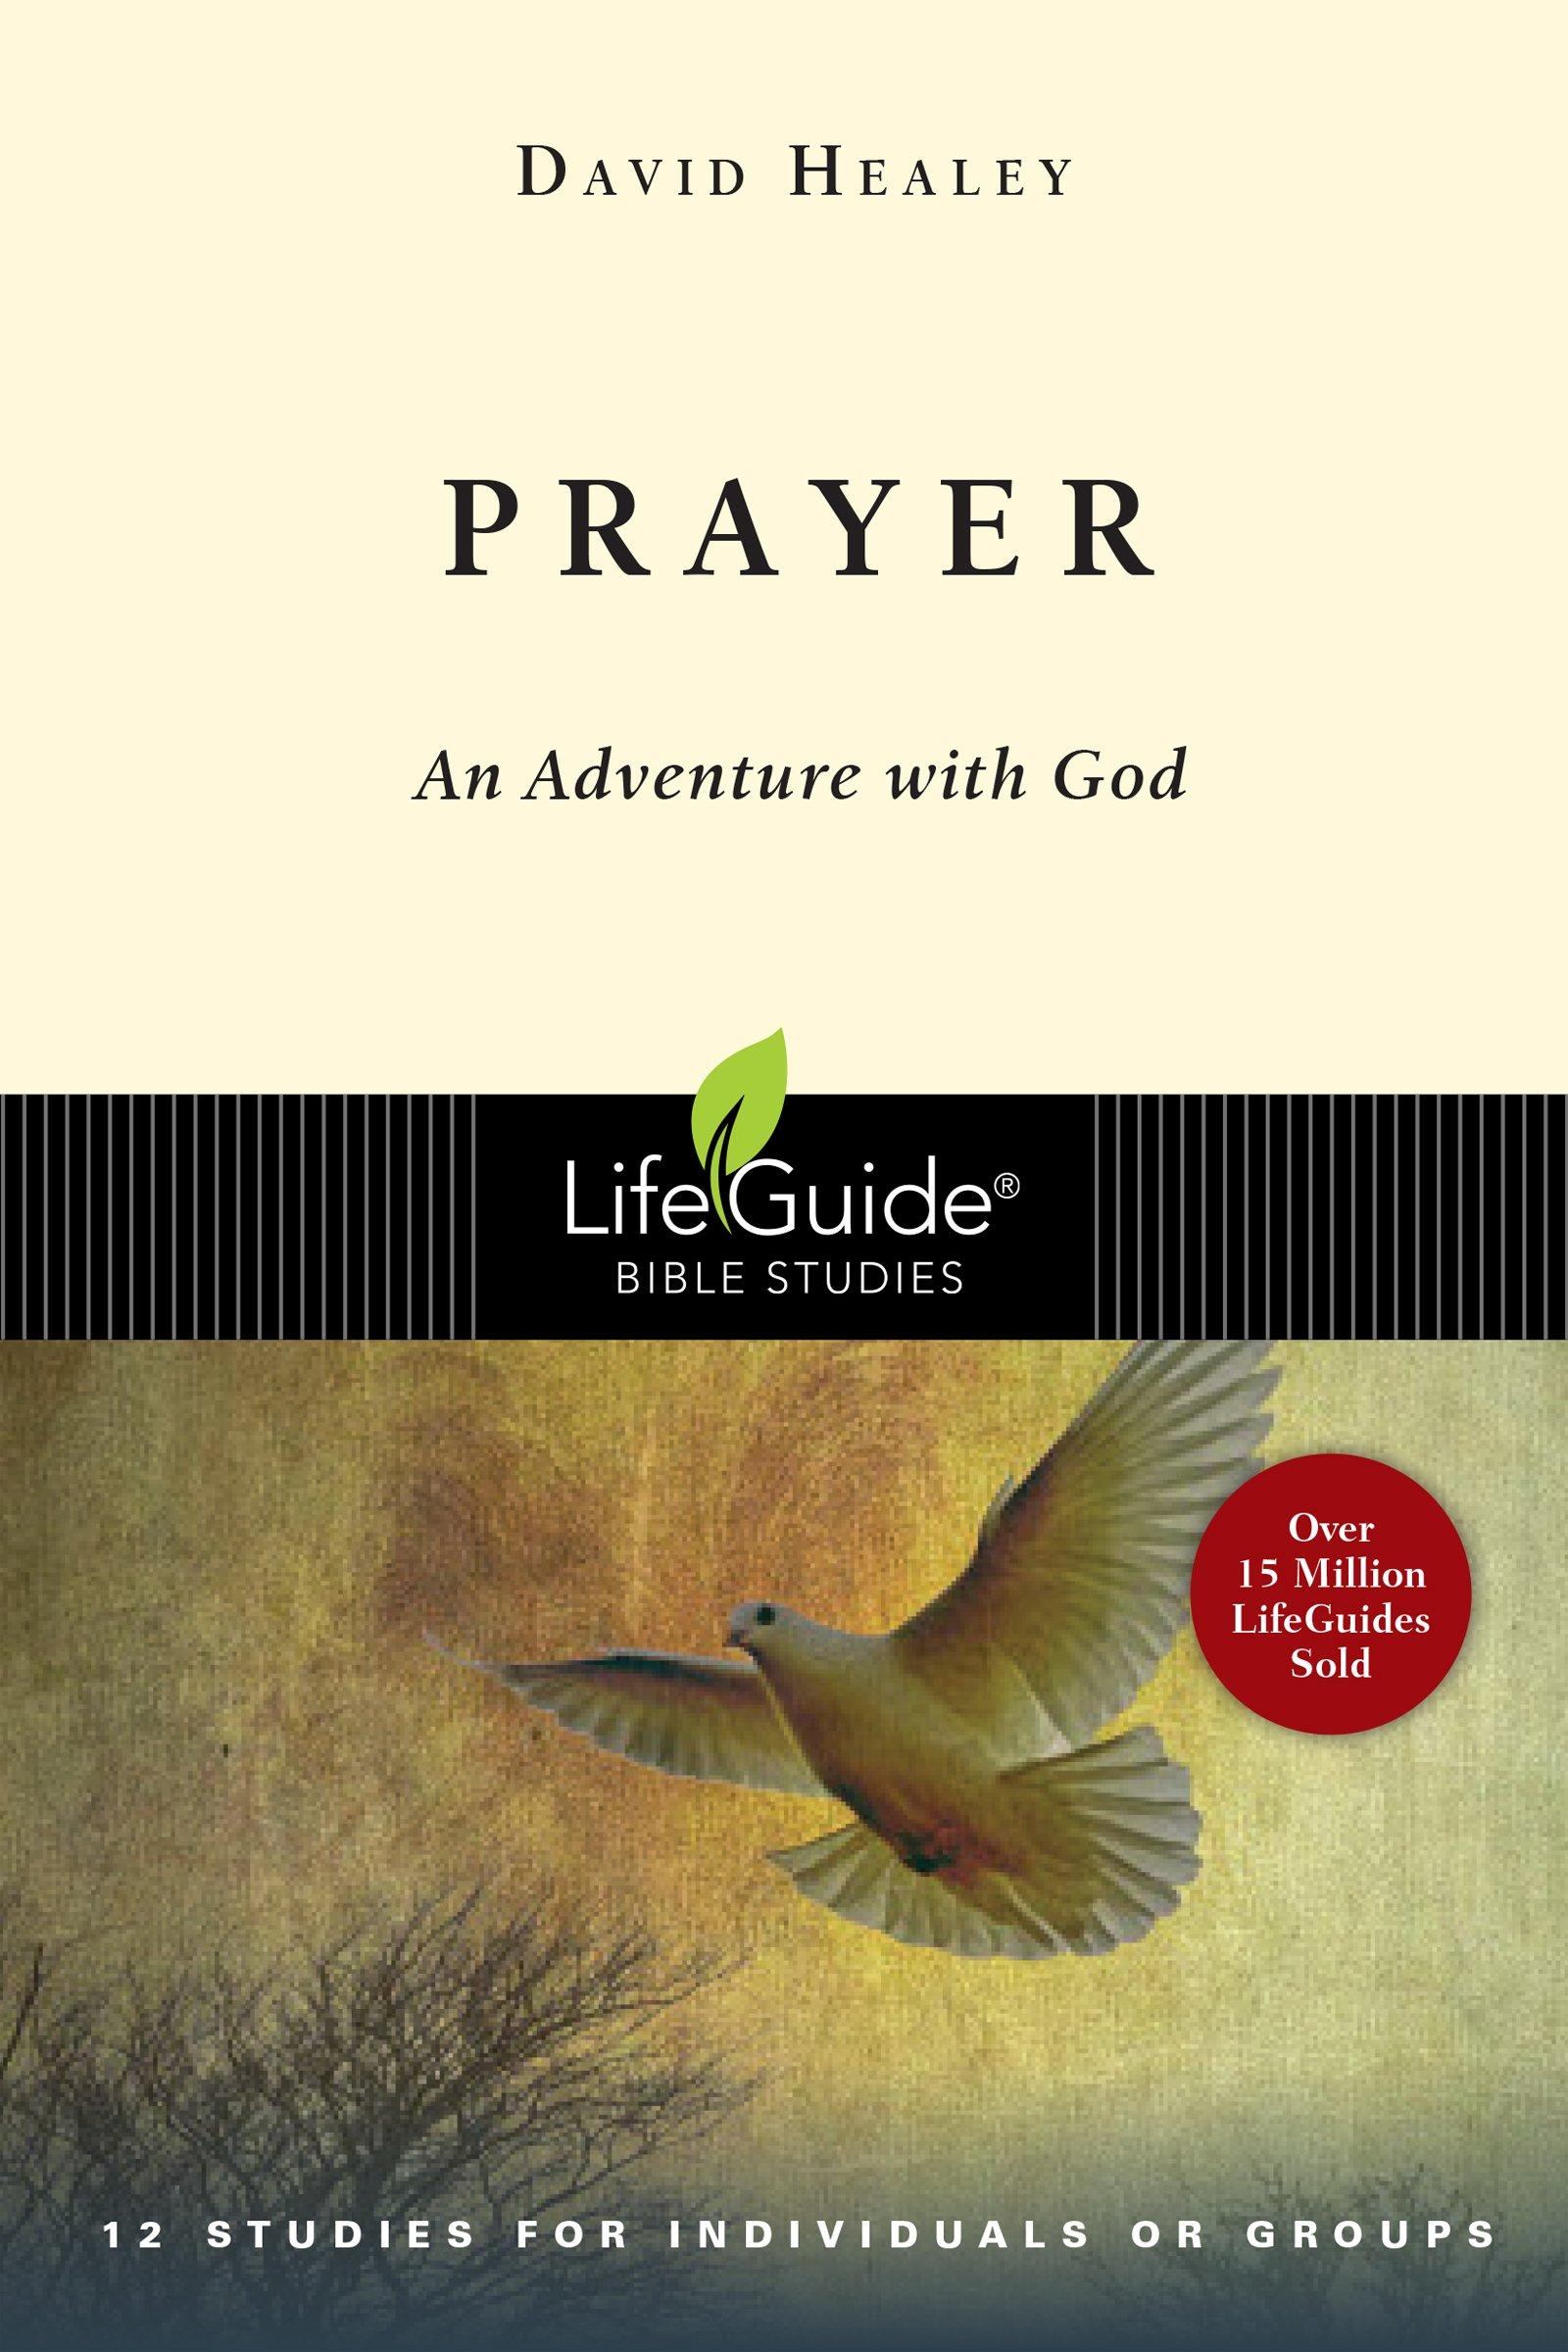 Prayer: An Adventure with God (Lifeguide Bible Studies) PDF